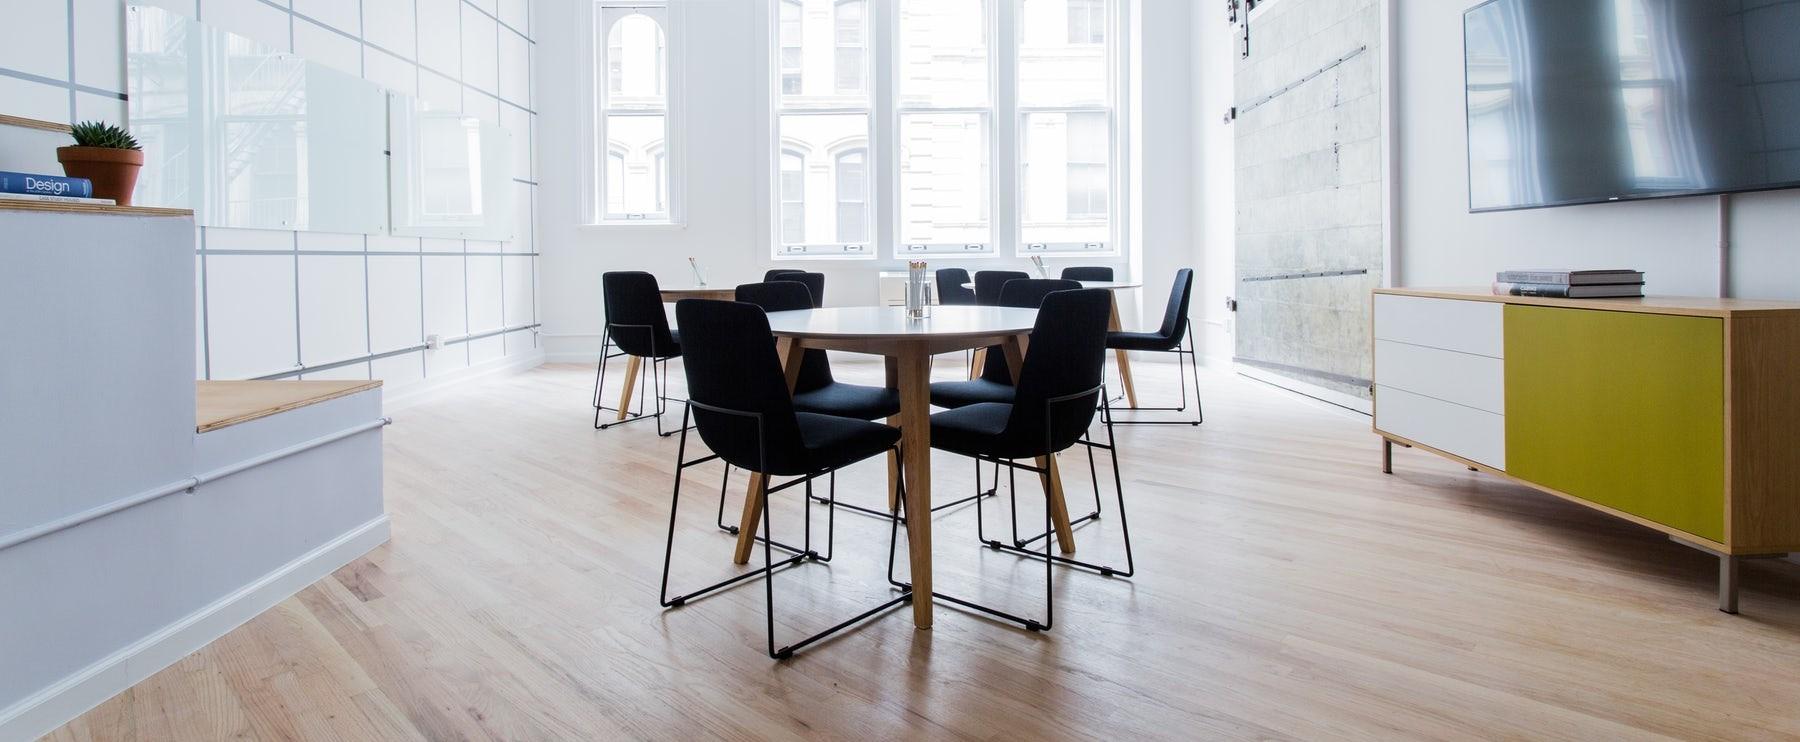 Salle de reunion lumineuse avec 3 tables